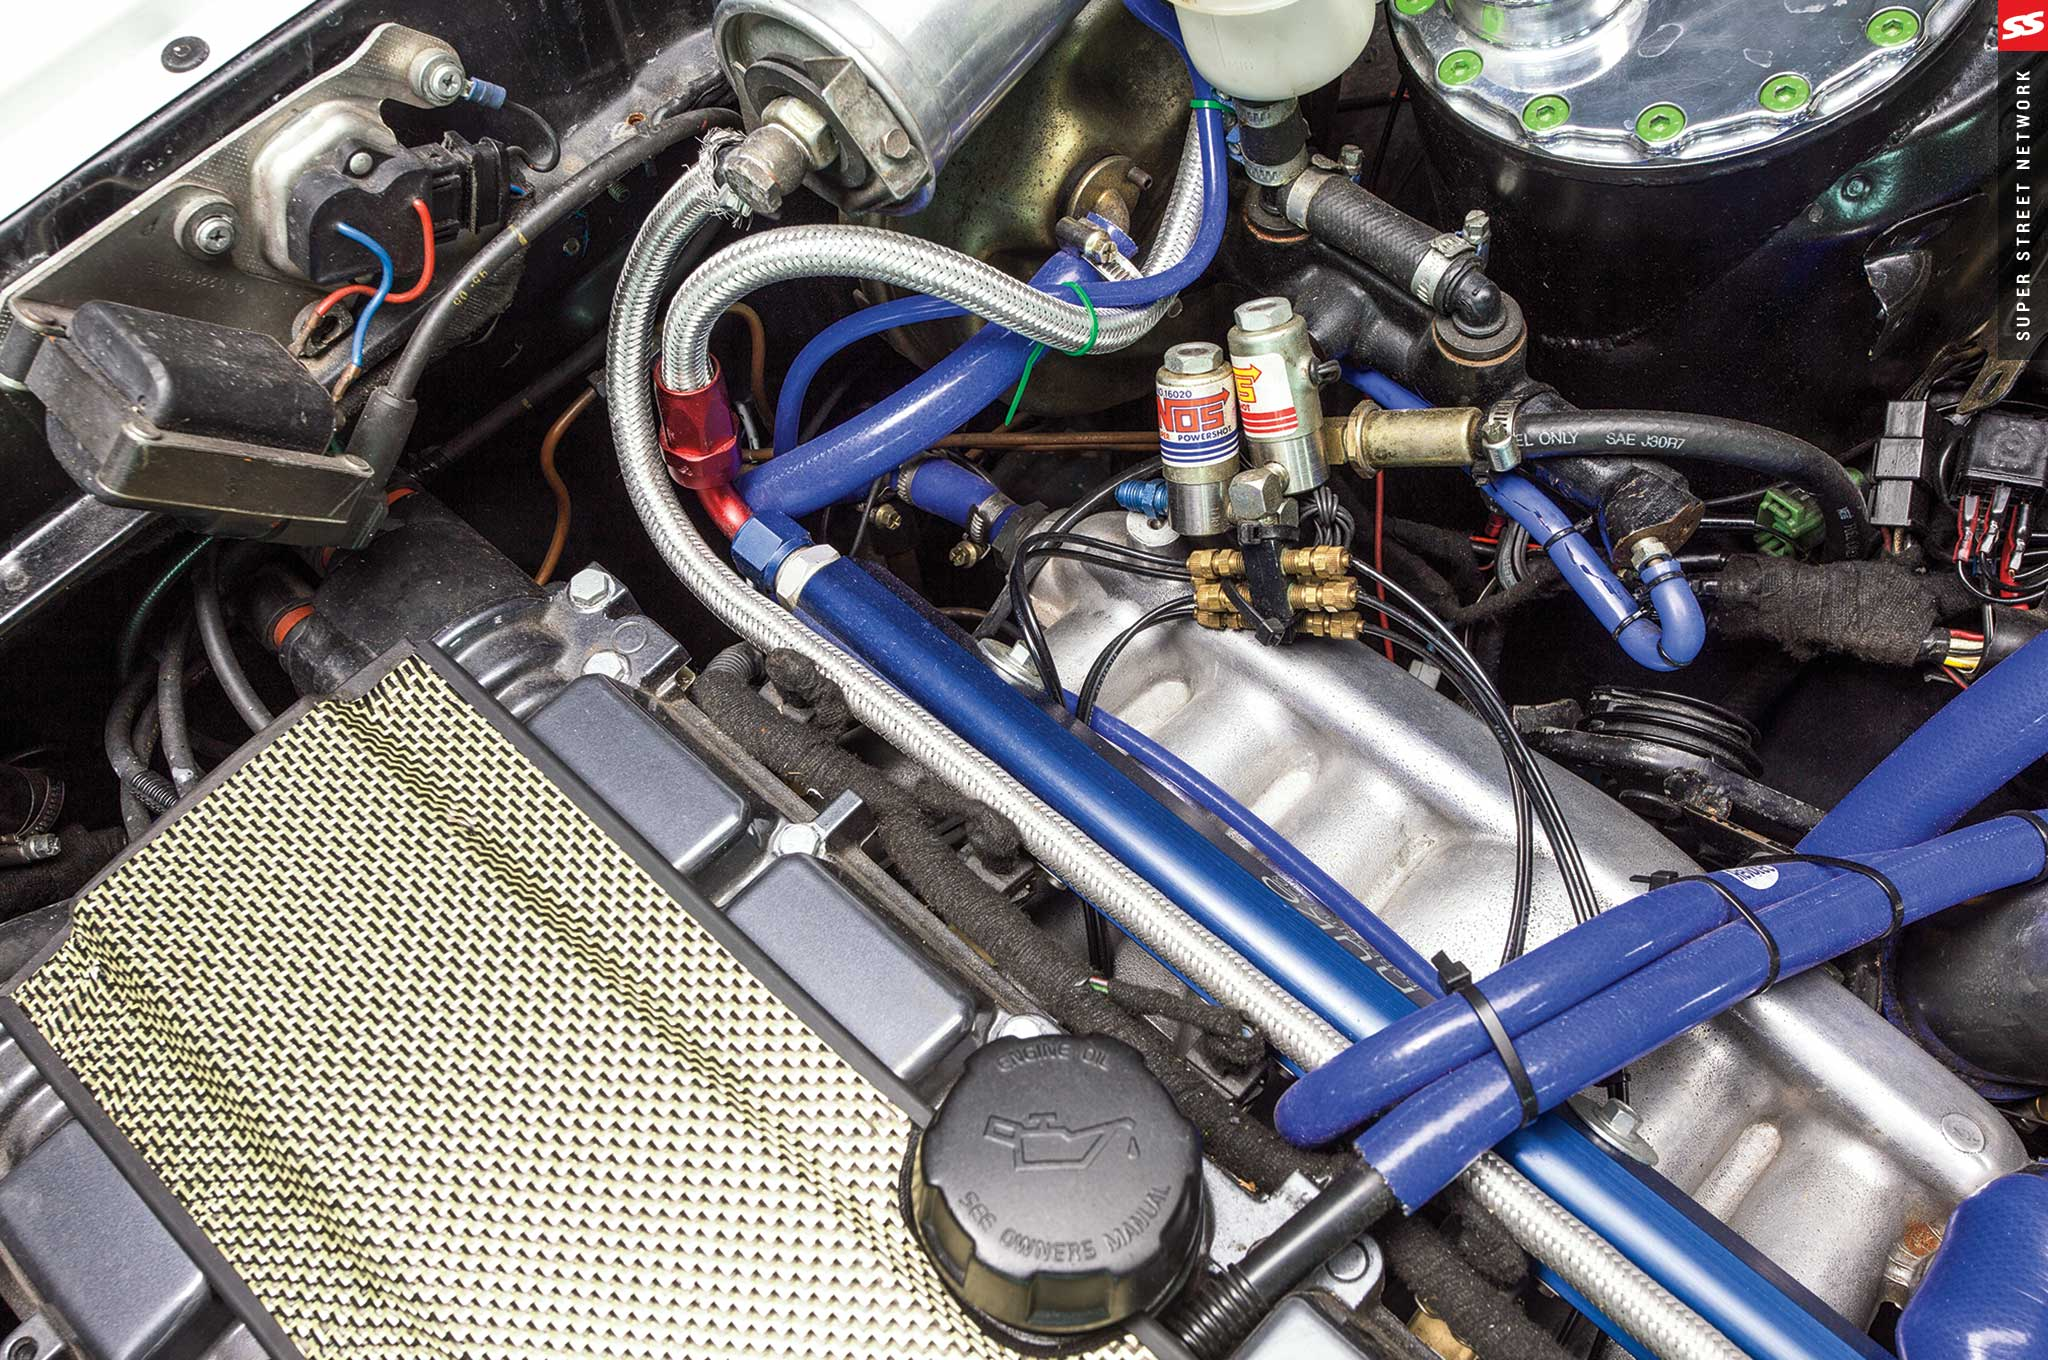 Volvo 850 Radiator Drain Plug